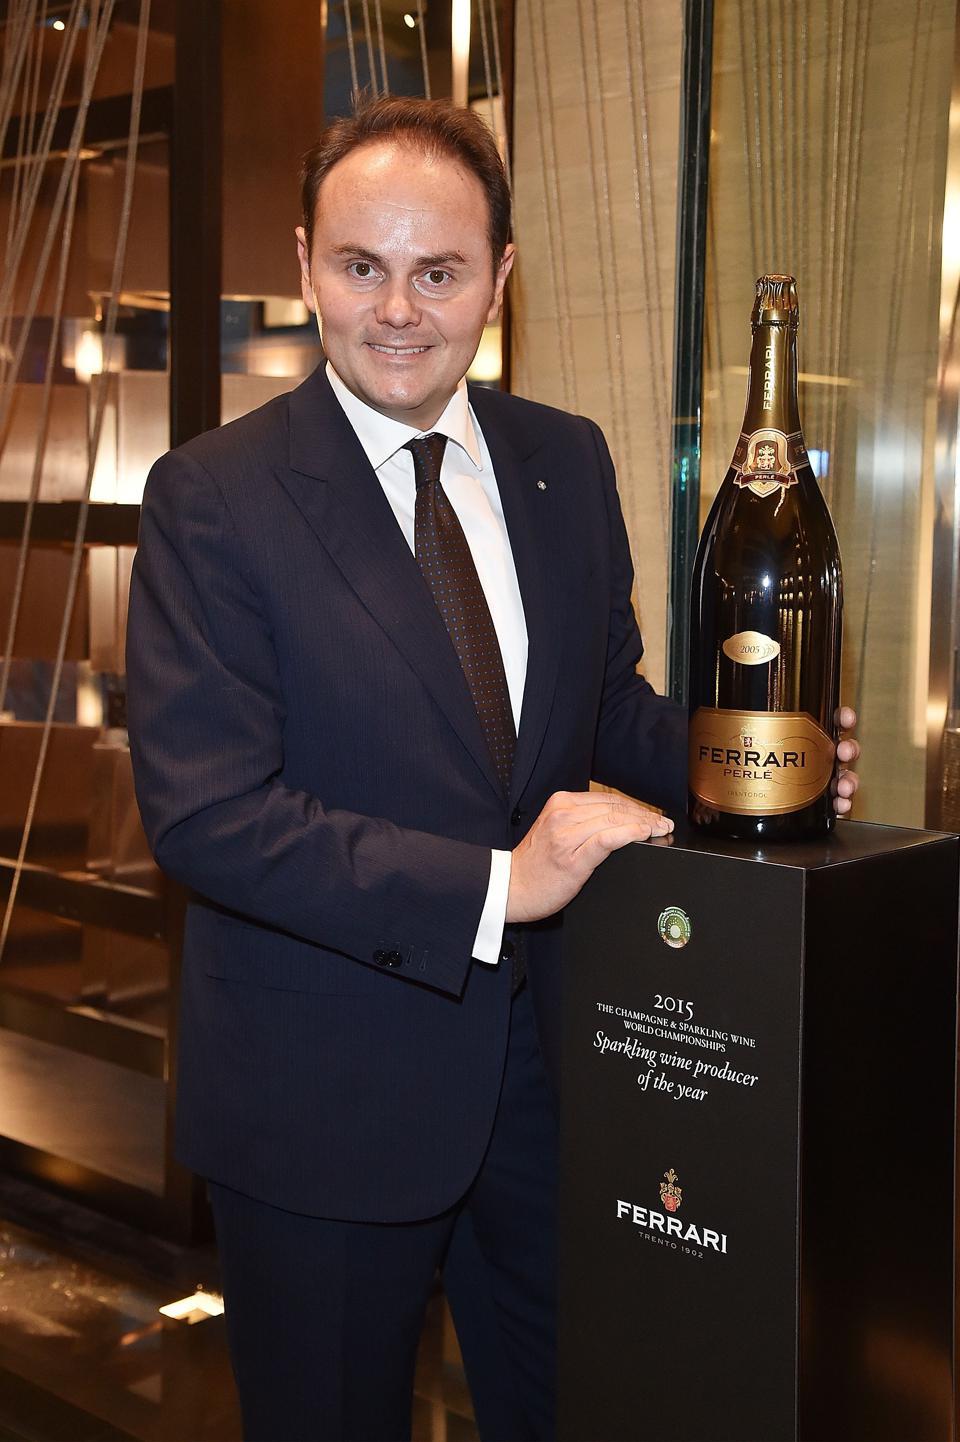 La Vendemmia 2015 - The World's Finest Wine & Lifestyle Experience